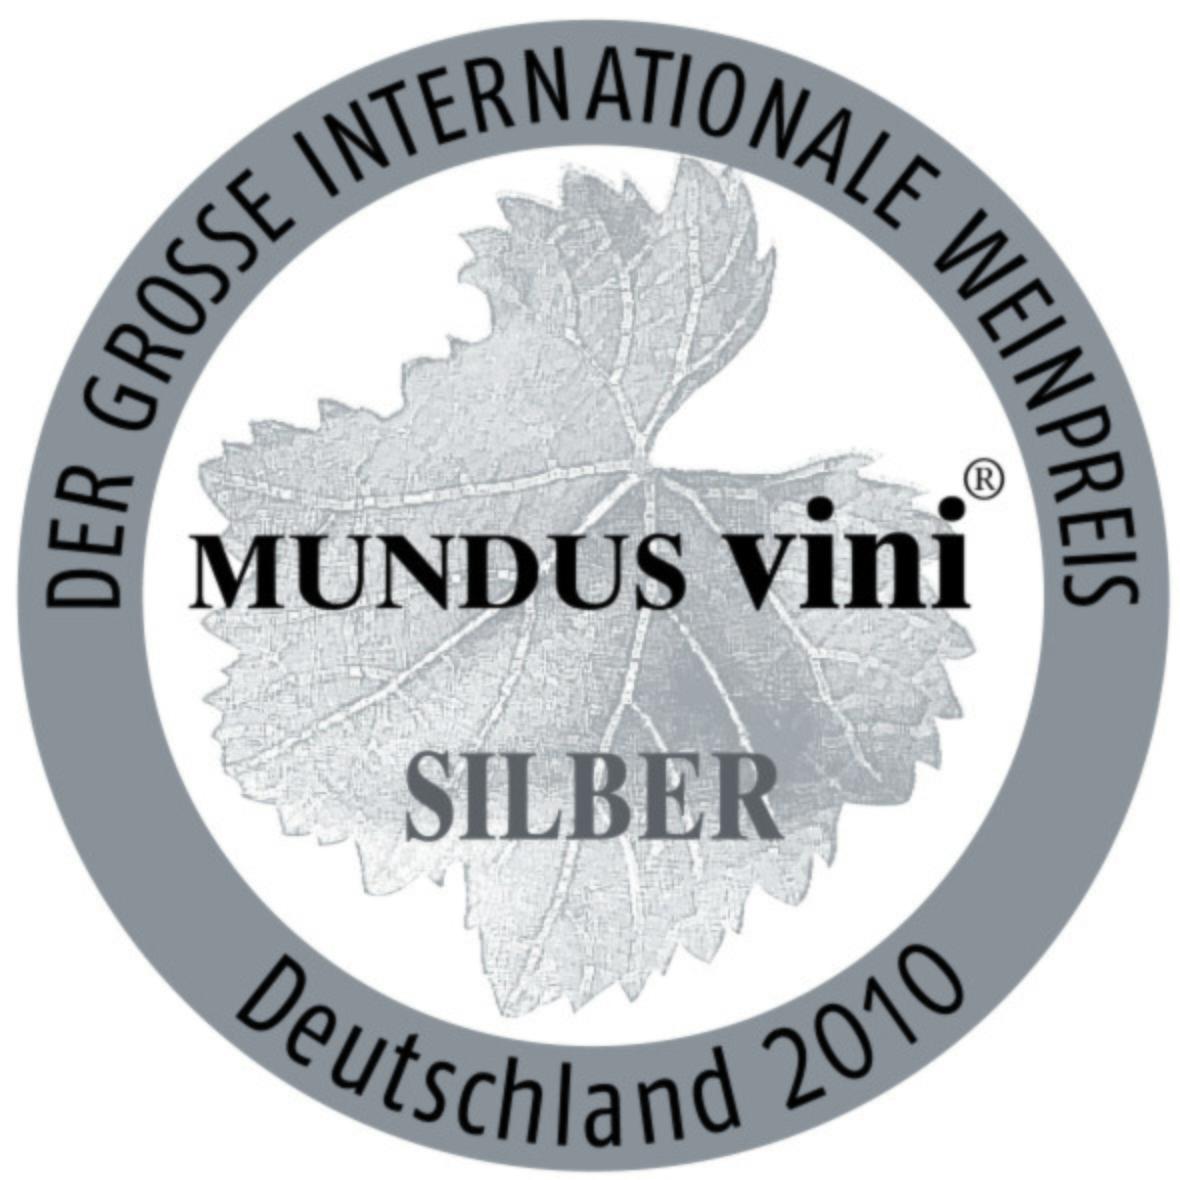 MUNDUS VINI 2015- Medalla de Plata